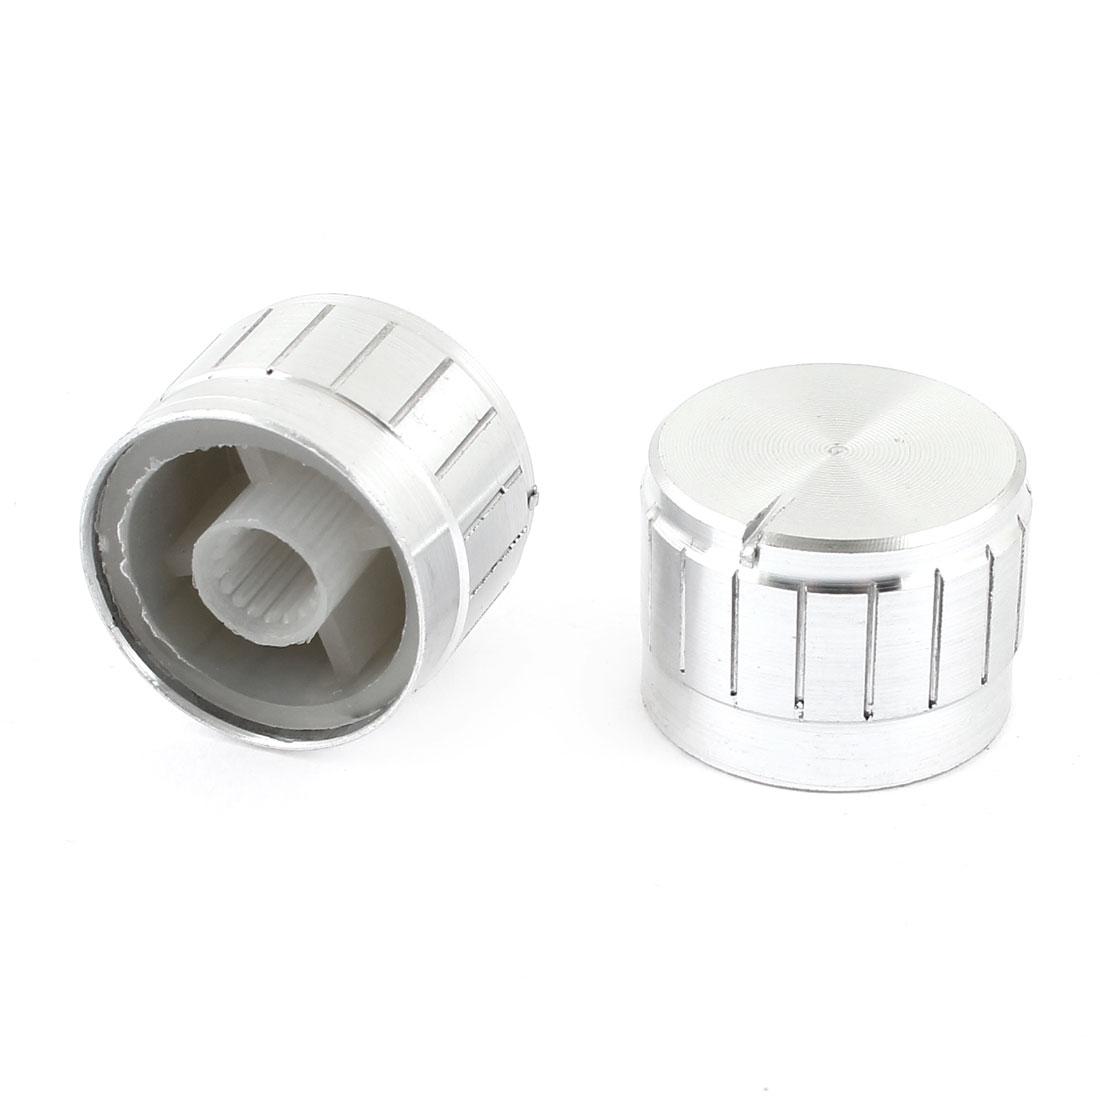 2 Pcs Silver Tone Volume Control Aluminum Potentiometer Knobs Caps 23mm x 17mm